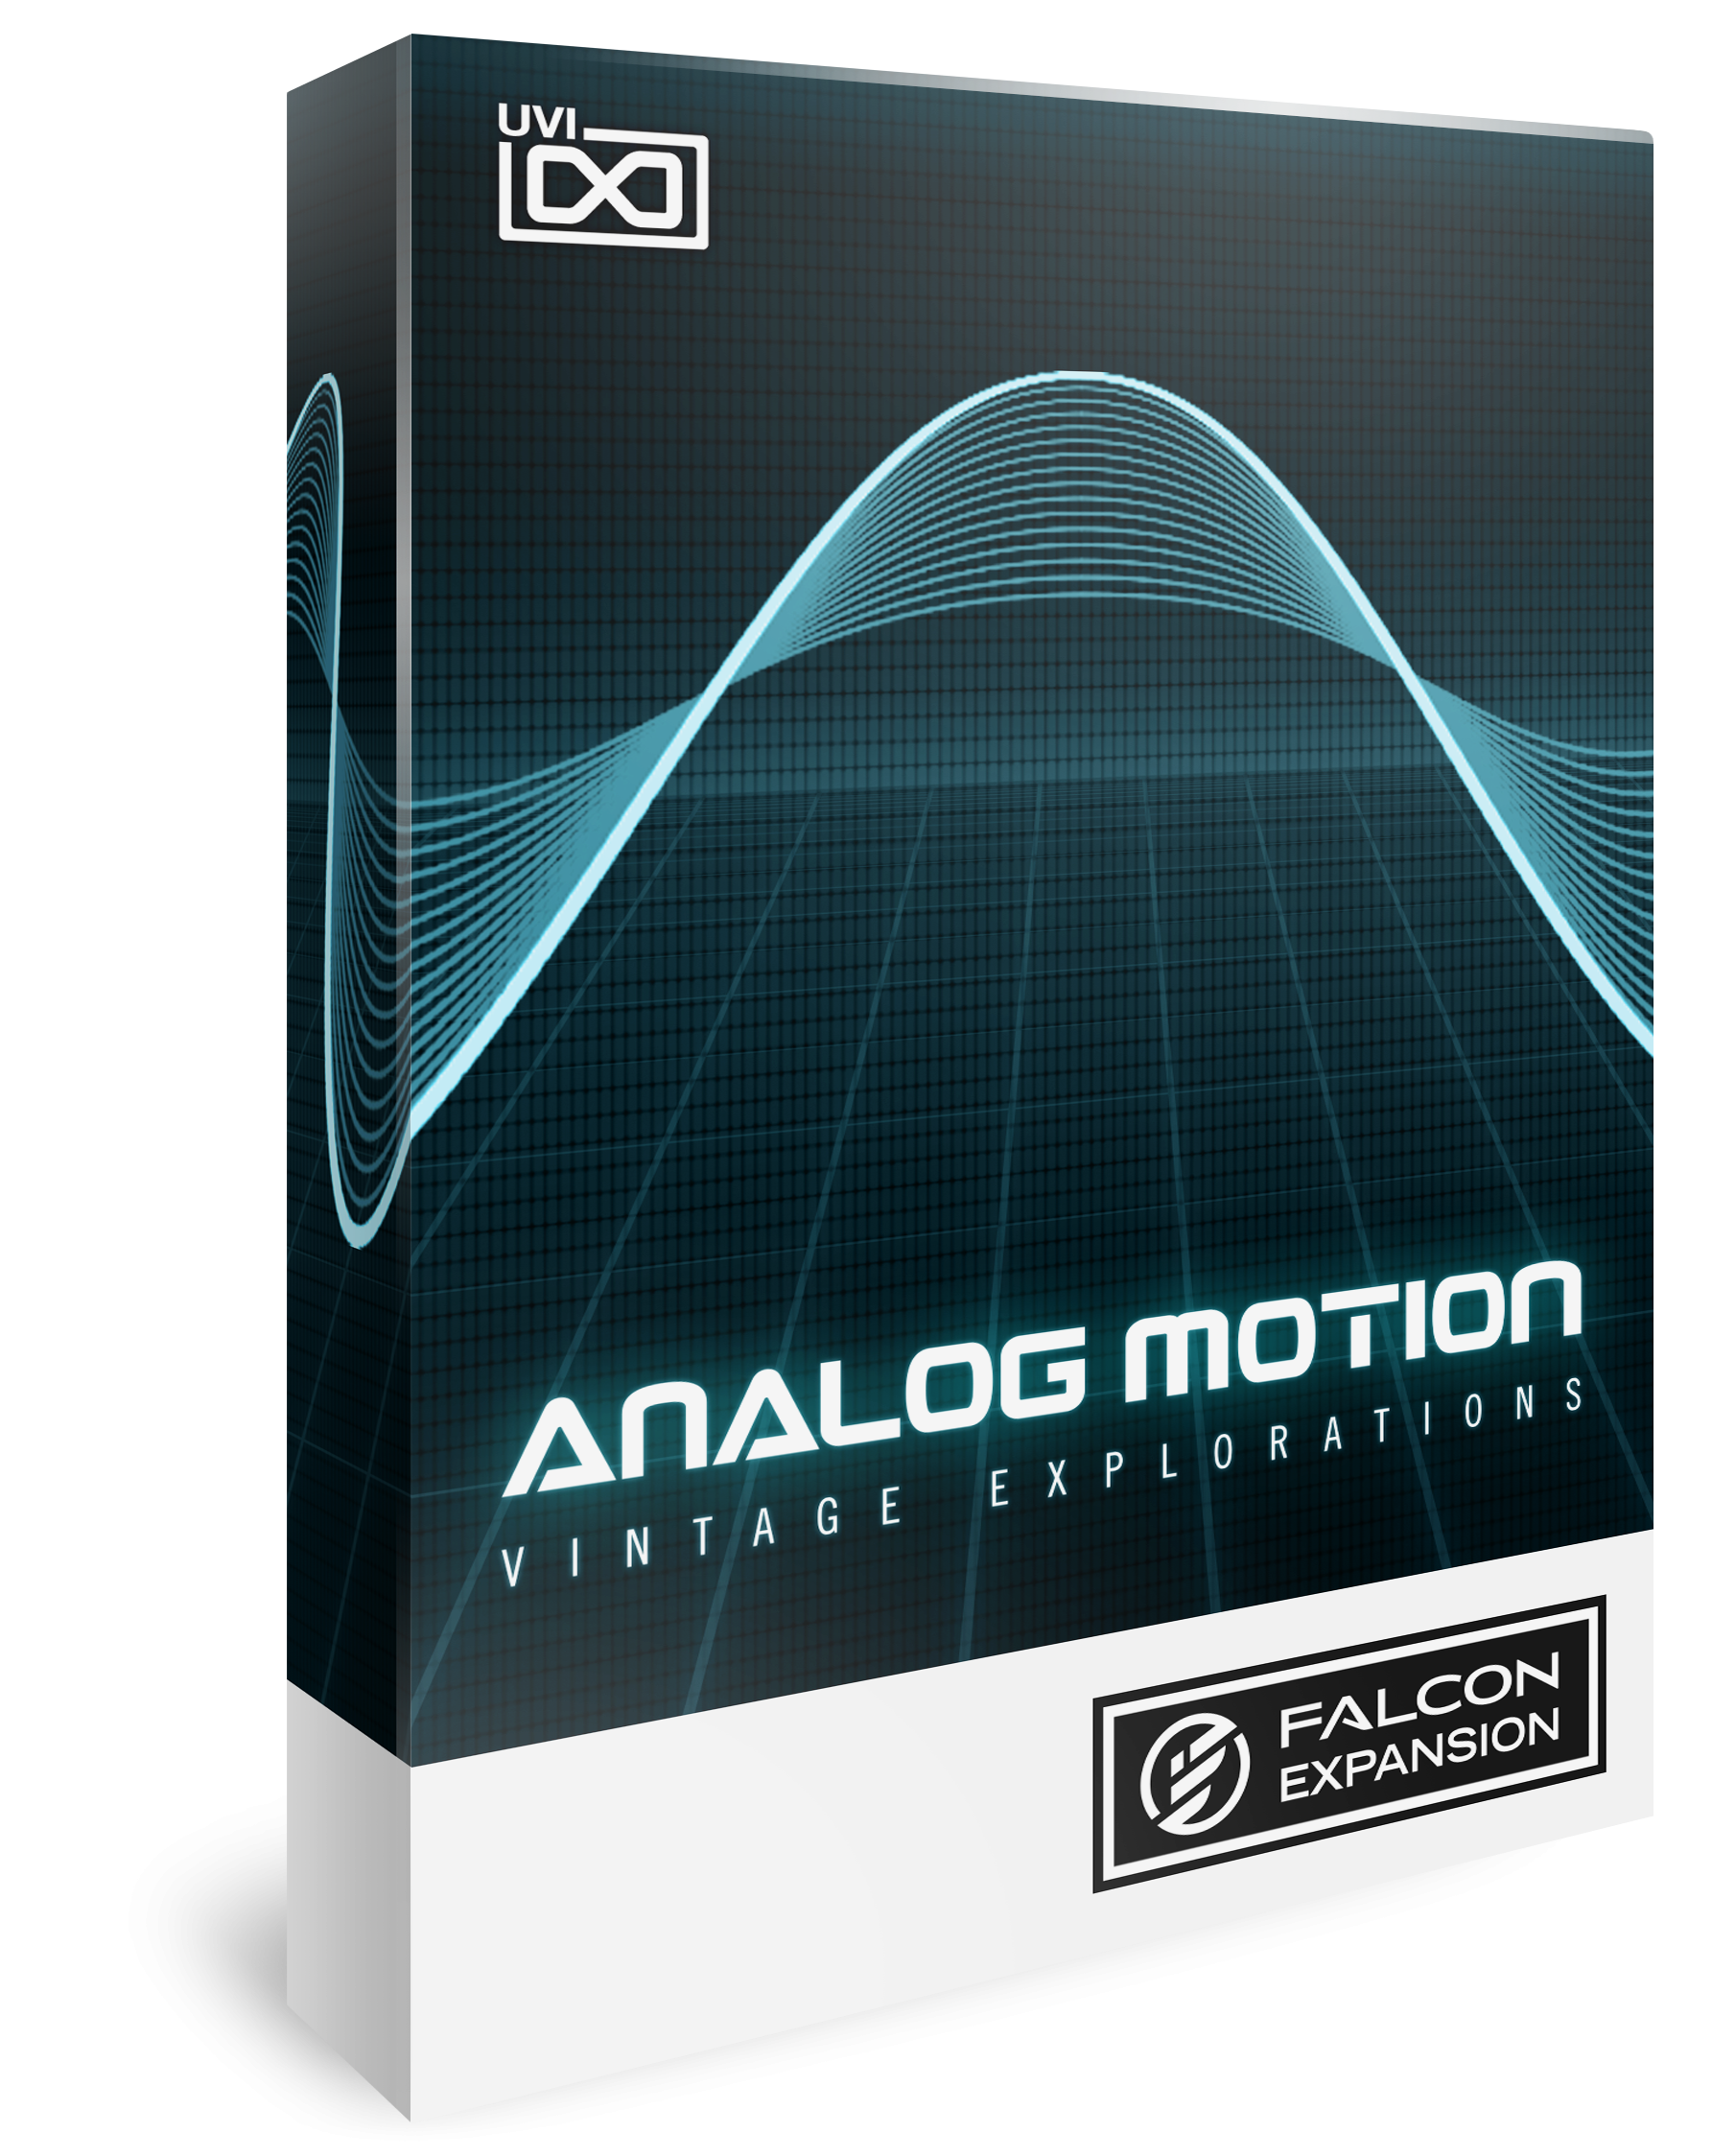 Analog Motion